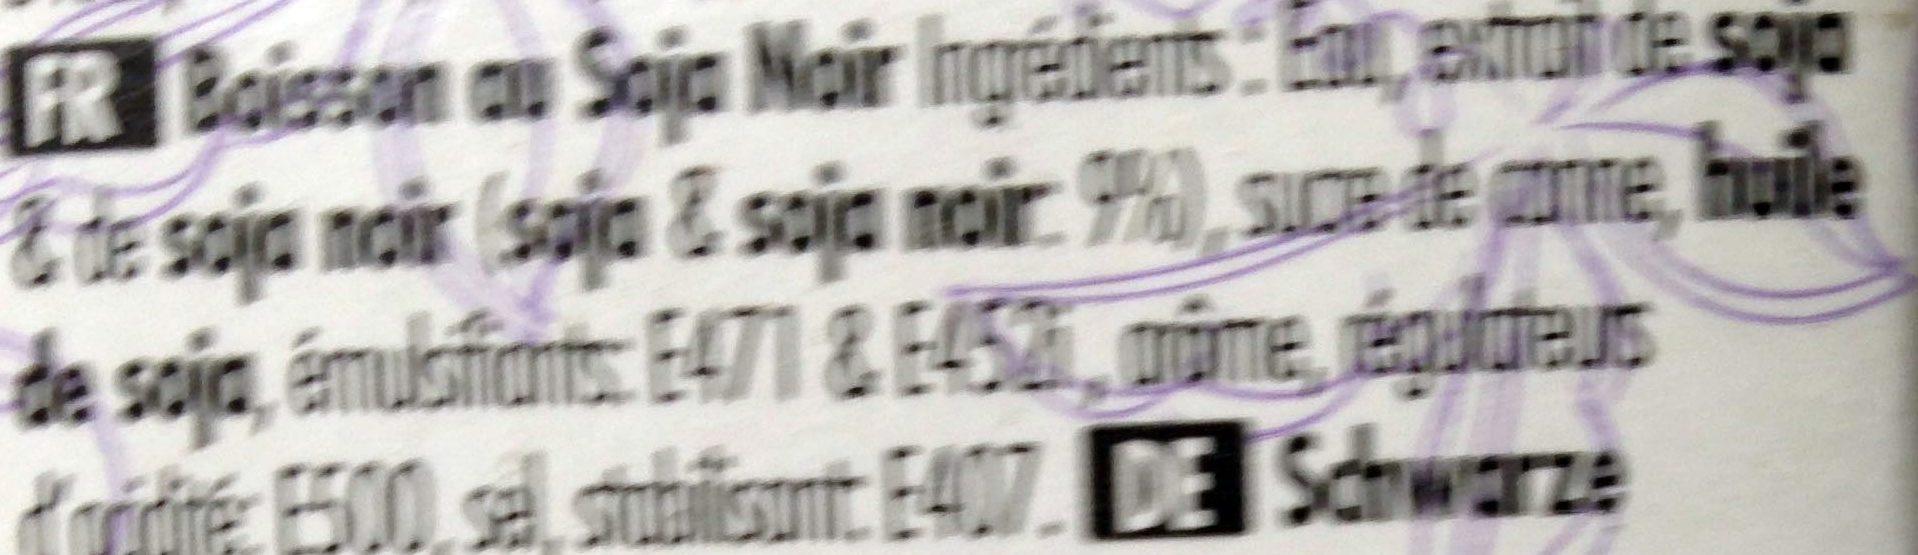 Boisson lait au soja noir - Ingredients - fr